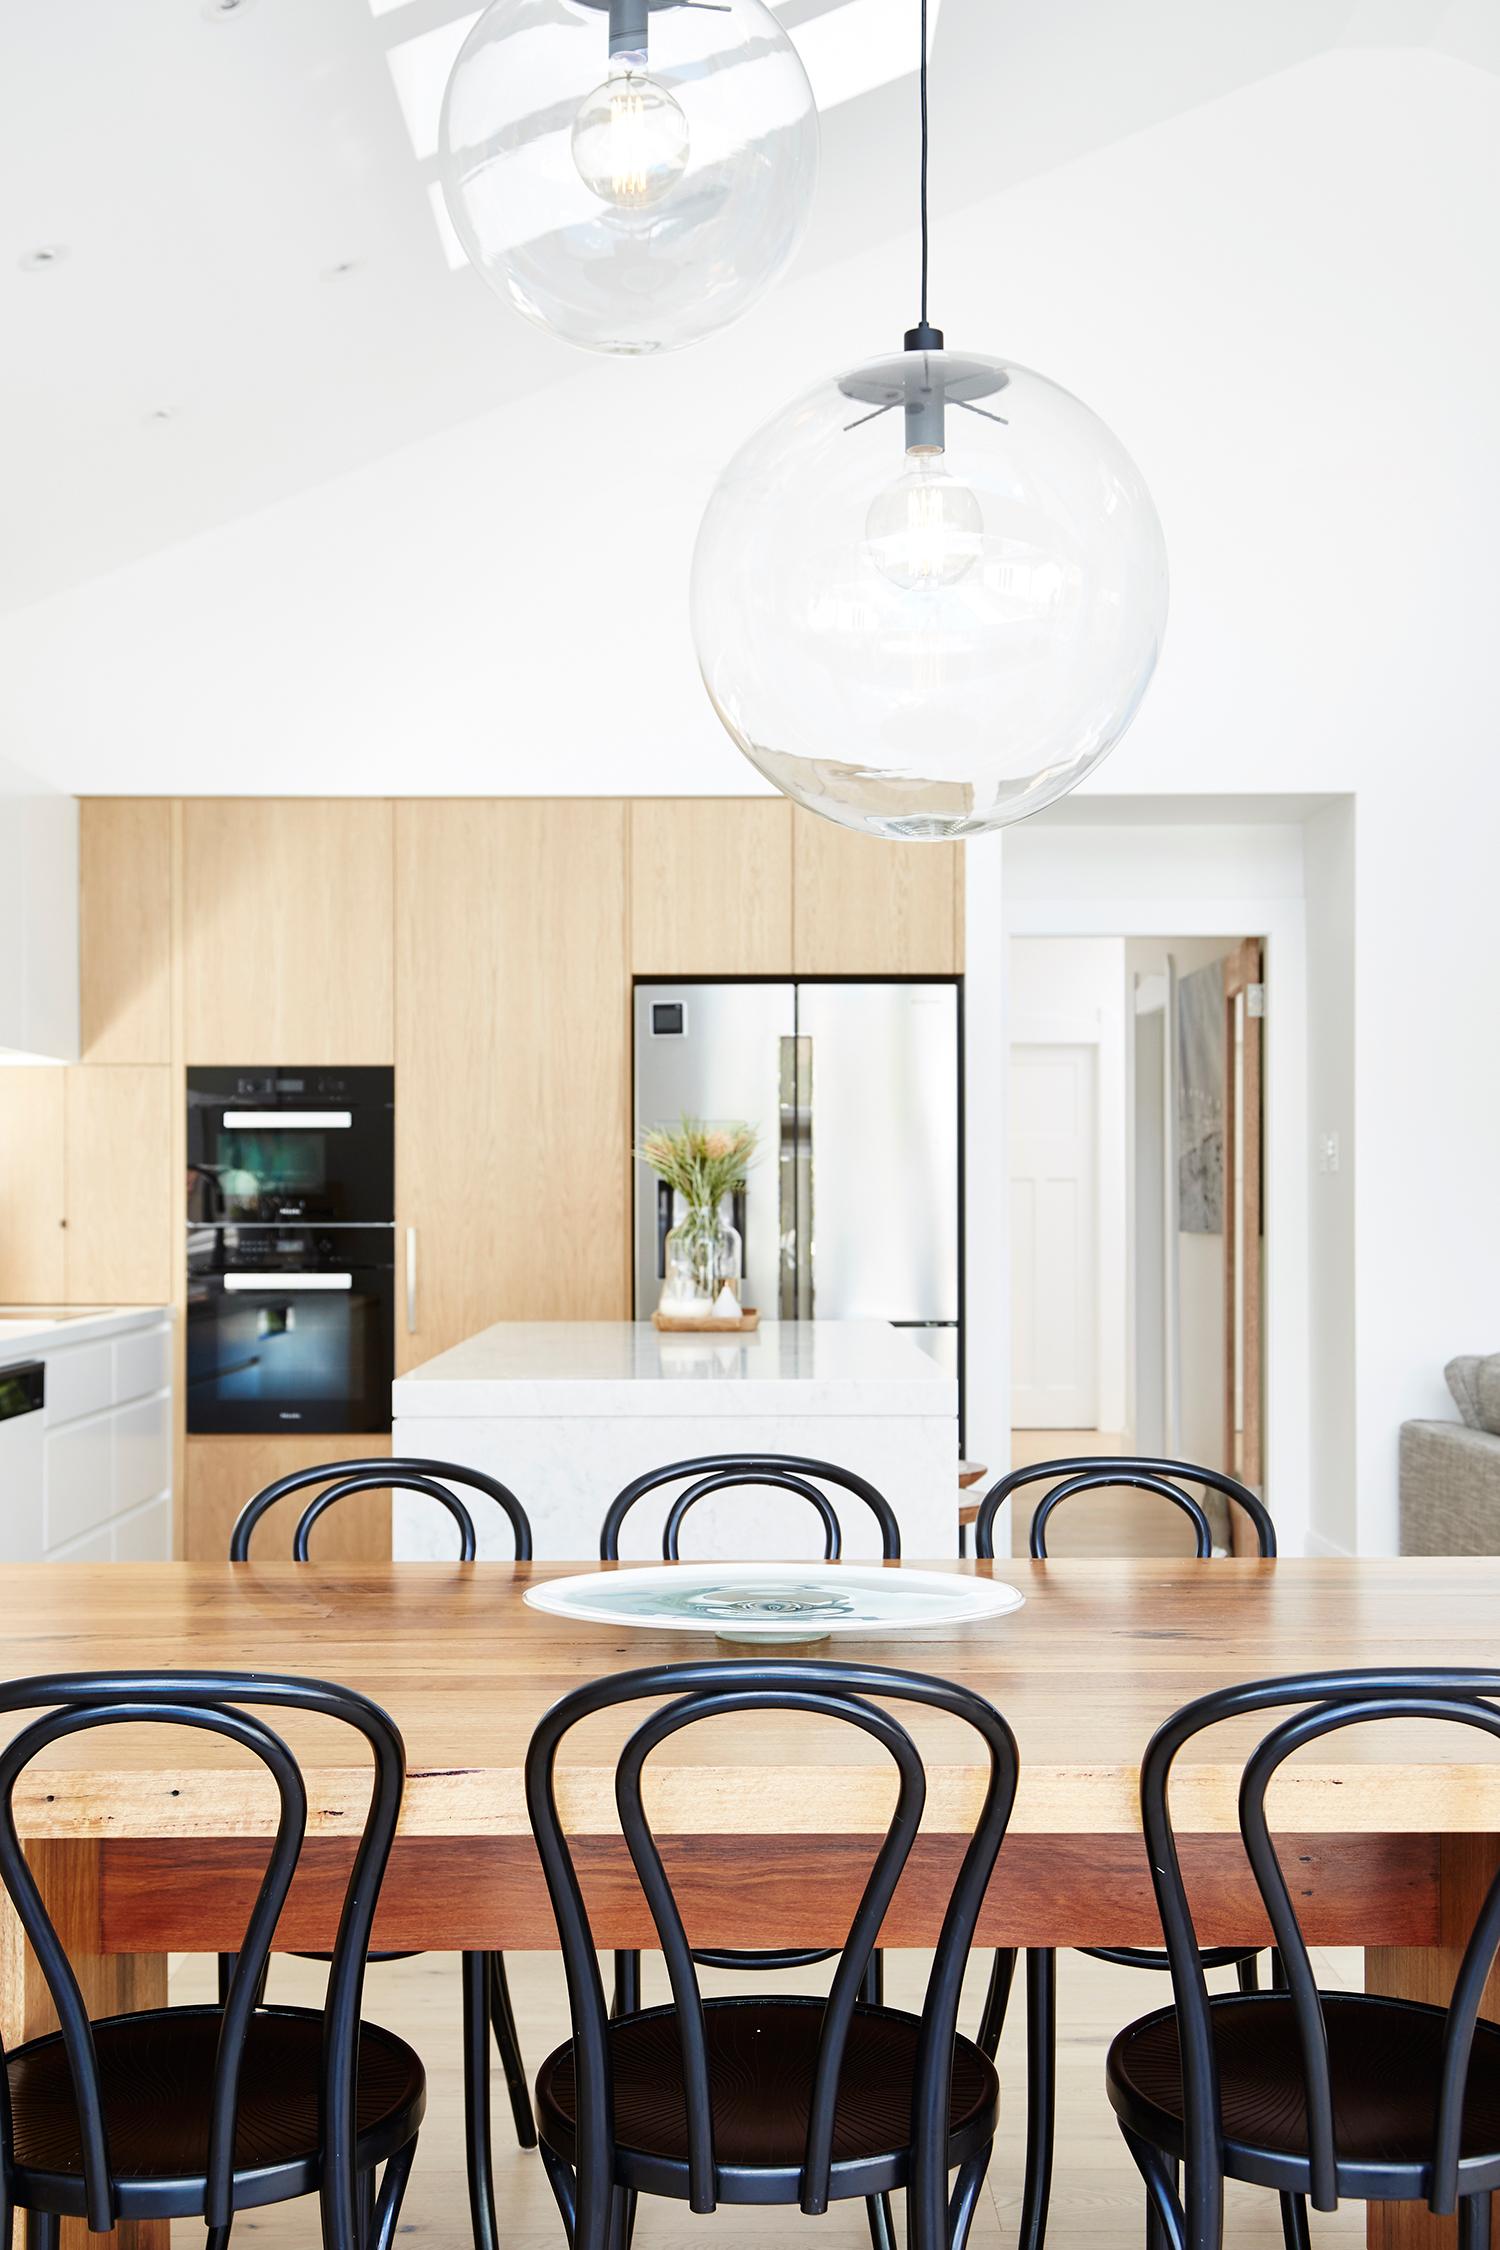 Benito-Martin-food-lifestyle-interior-portrait-photographer-sydney-130.jpg